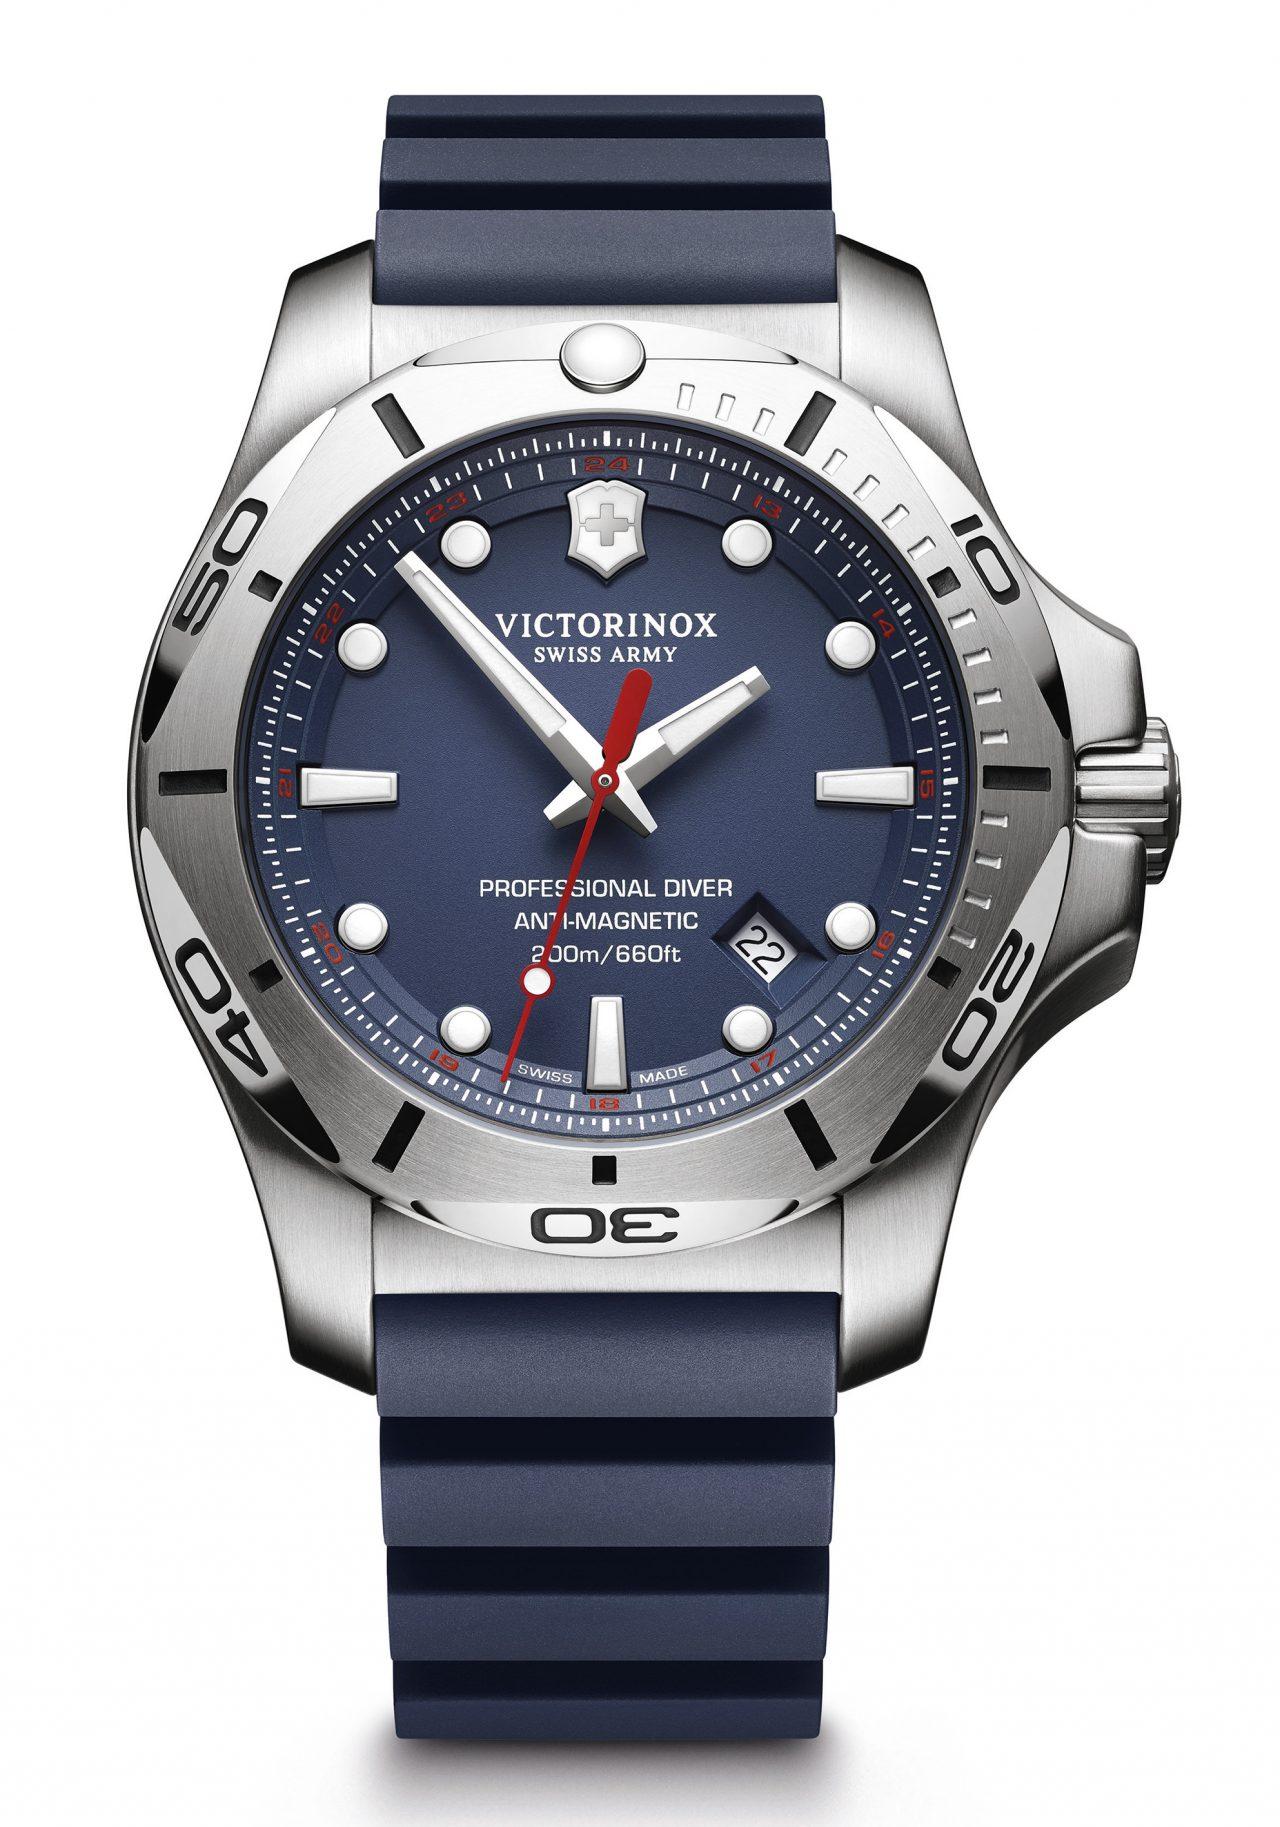 Victorinox I.N.O.X. Professional Diver Armbanduhr